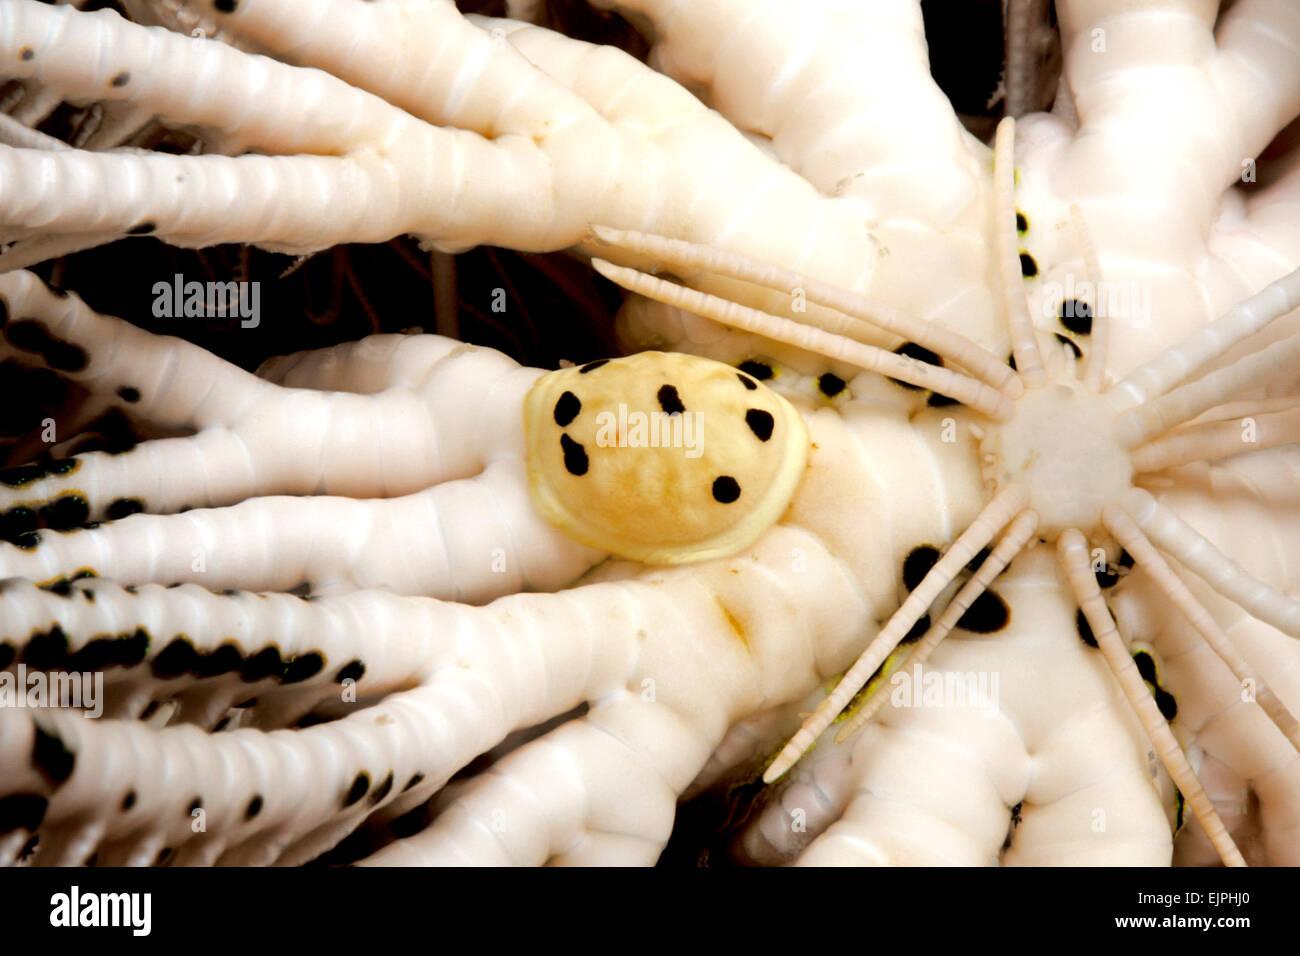 myzostomida-worm-a-small-marine-polychae